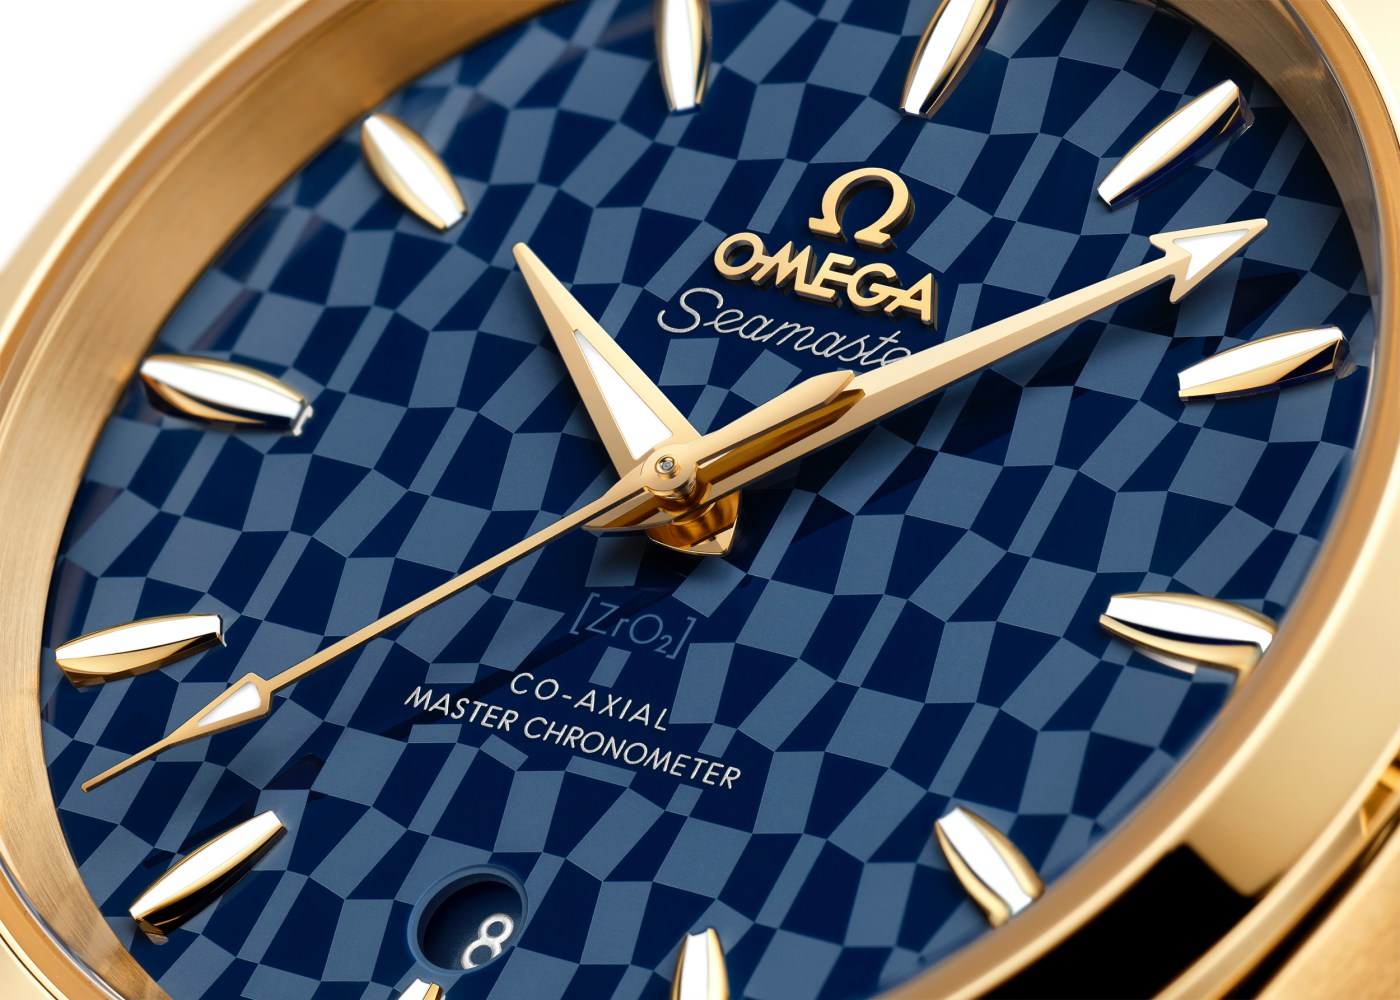 Omega Seamaster Aqua Terra Tokyo 2020 close-up